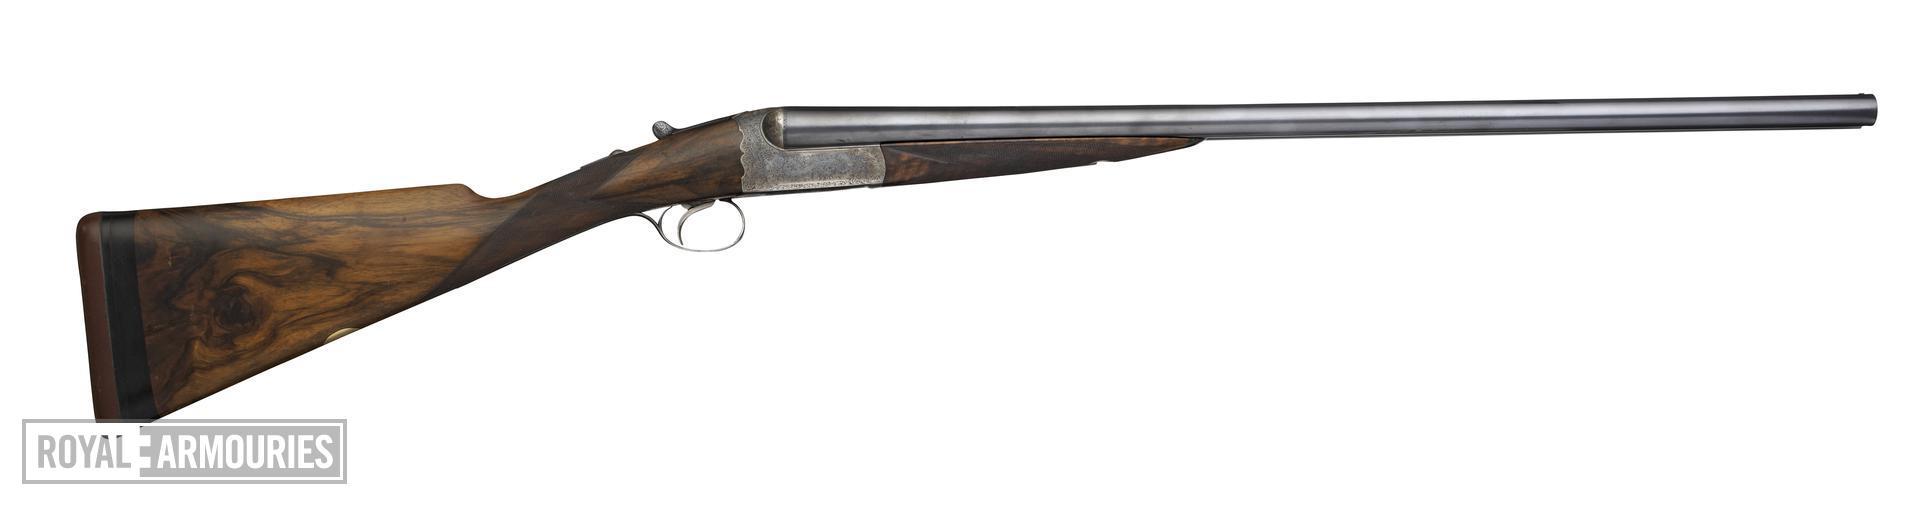 Centrefire double-barrelled shotgun - Westley Richards